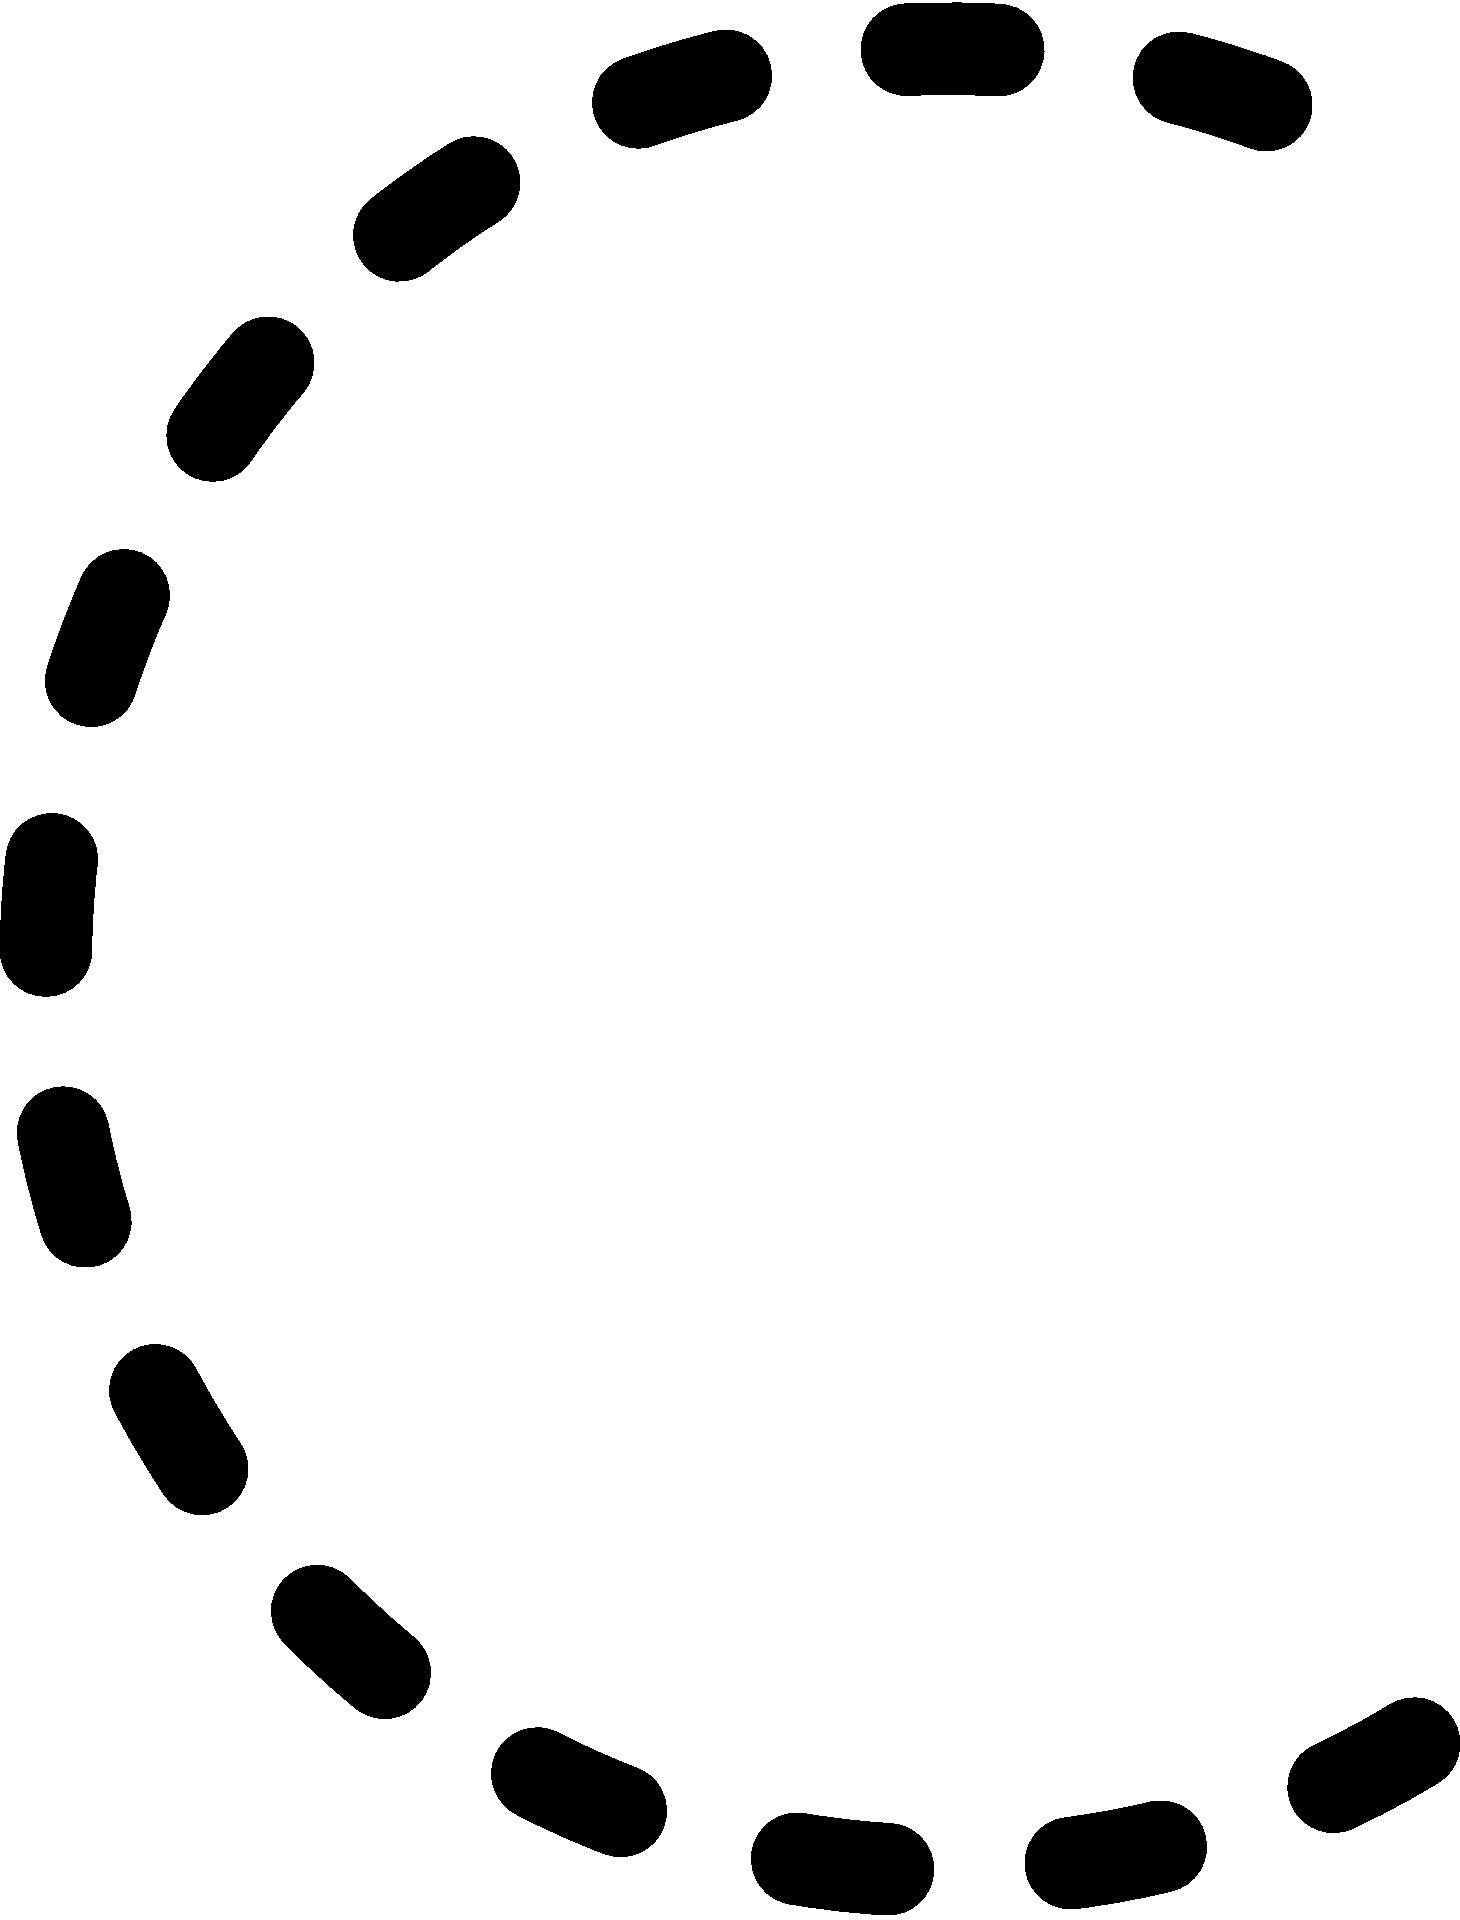 Dashed Line Of Alphabet Letter C Free Image